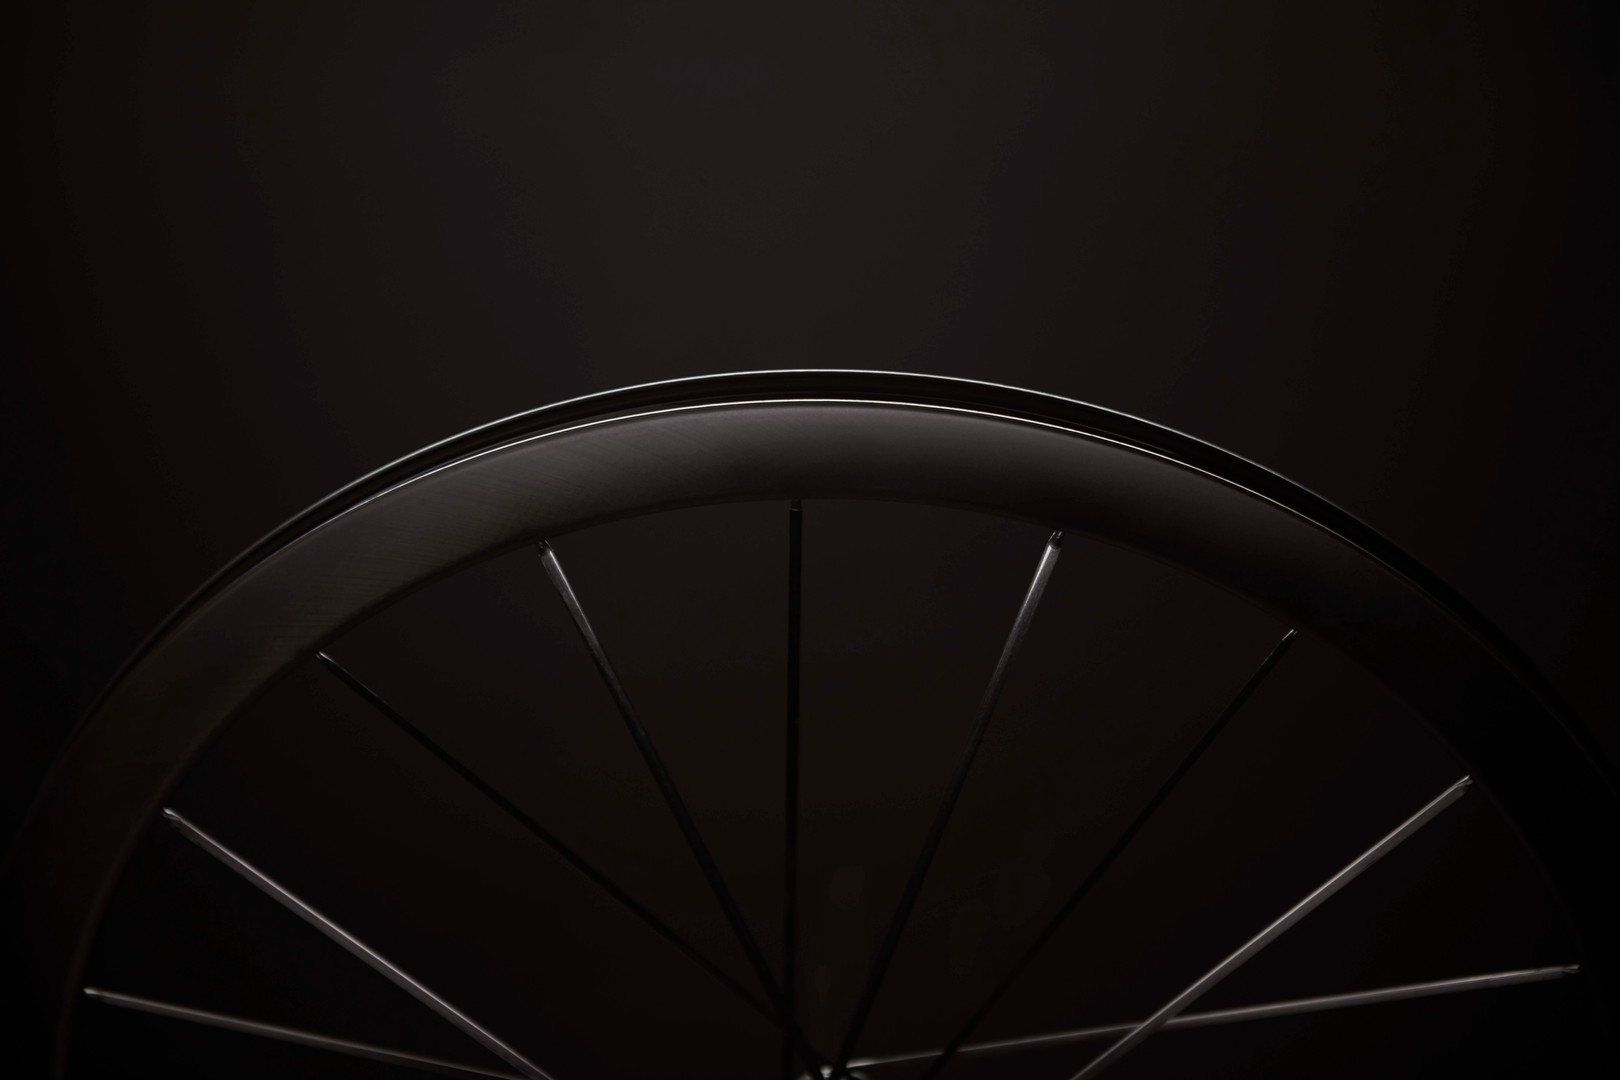 Wheels_3237_F.jpg